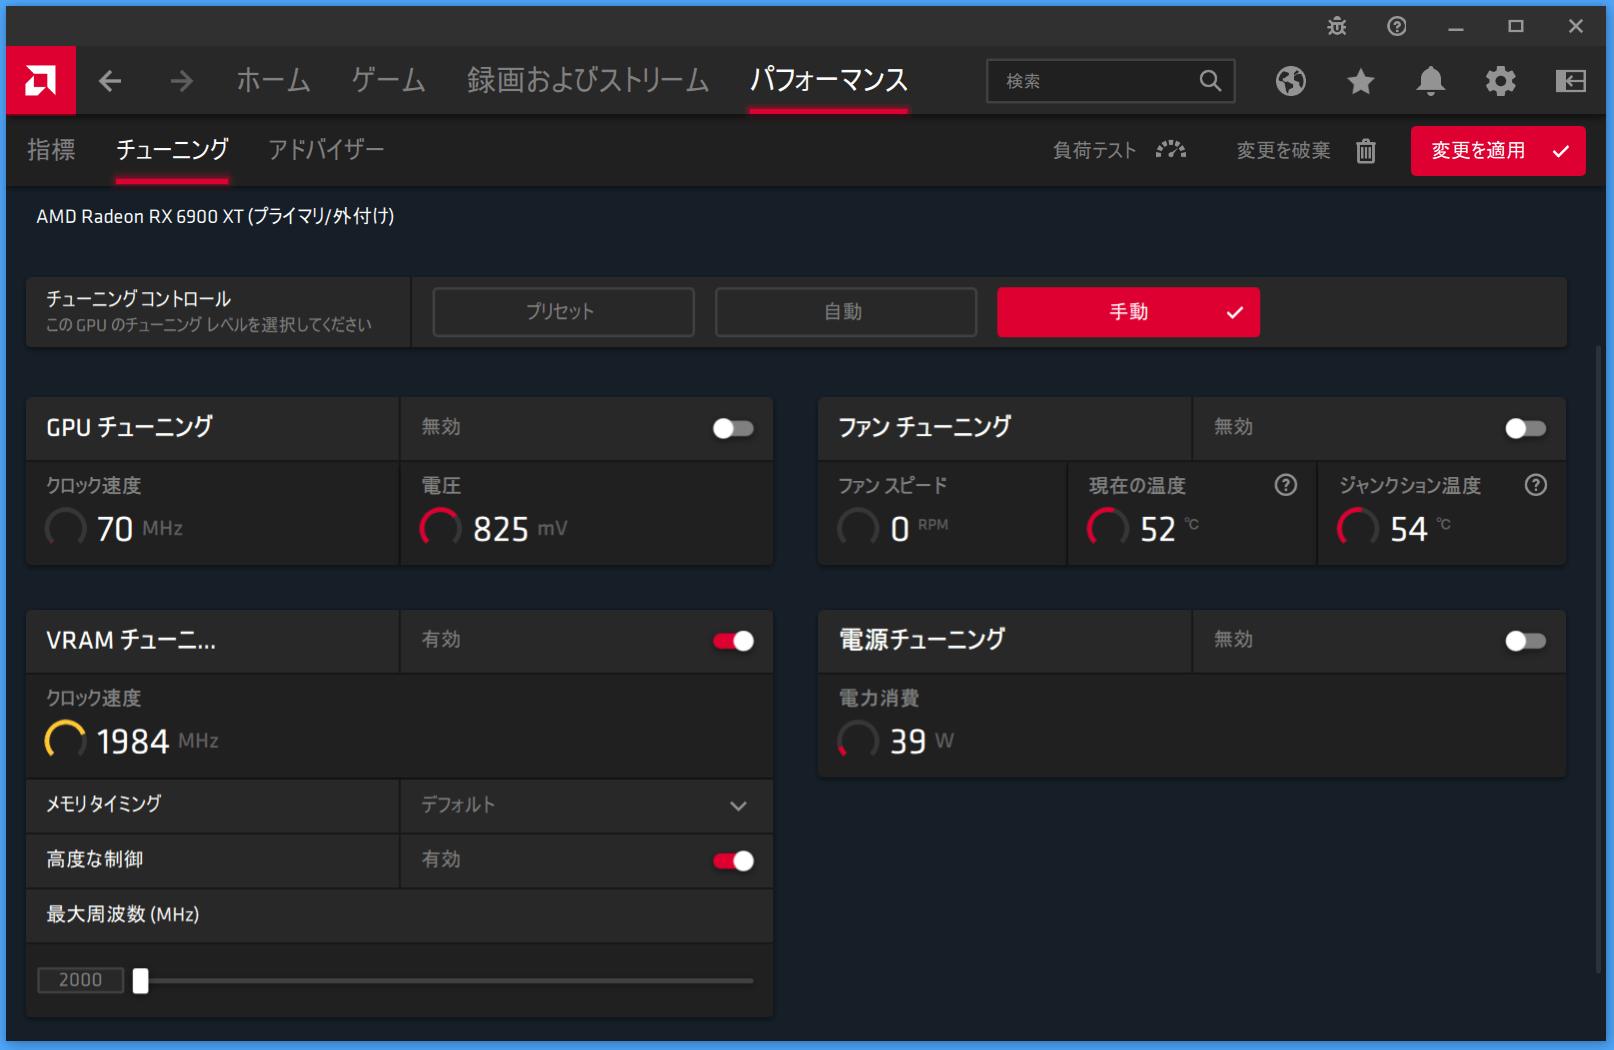 Radeon RX 6900 XT_Radeon-Setting_5_VRAM-Clock